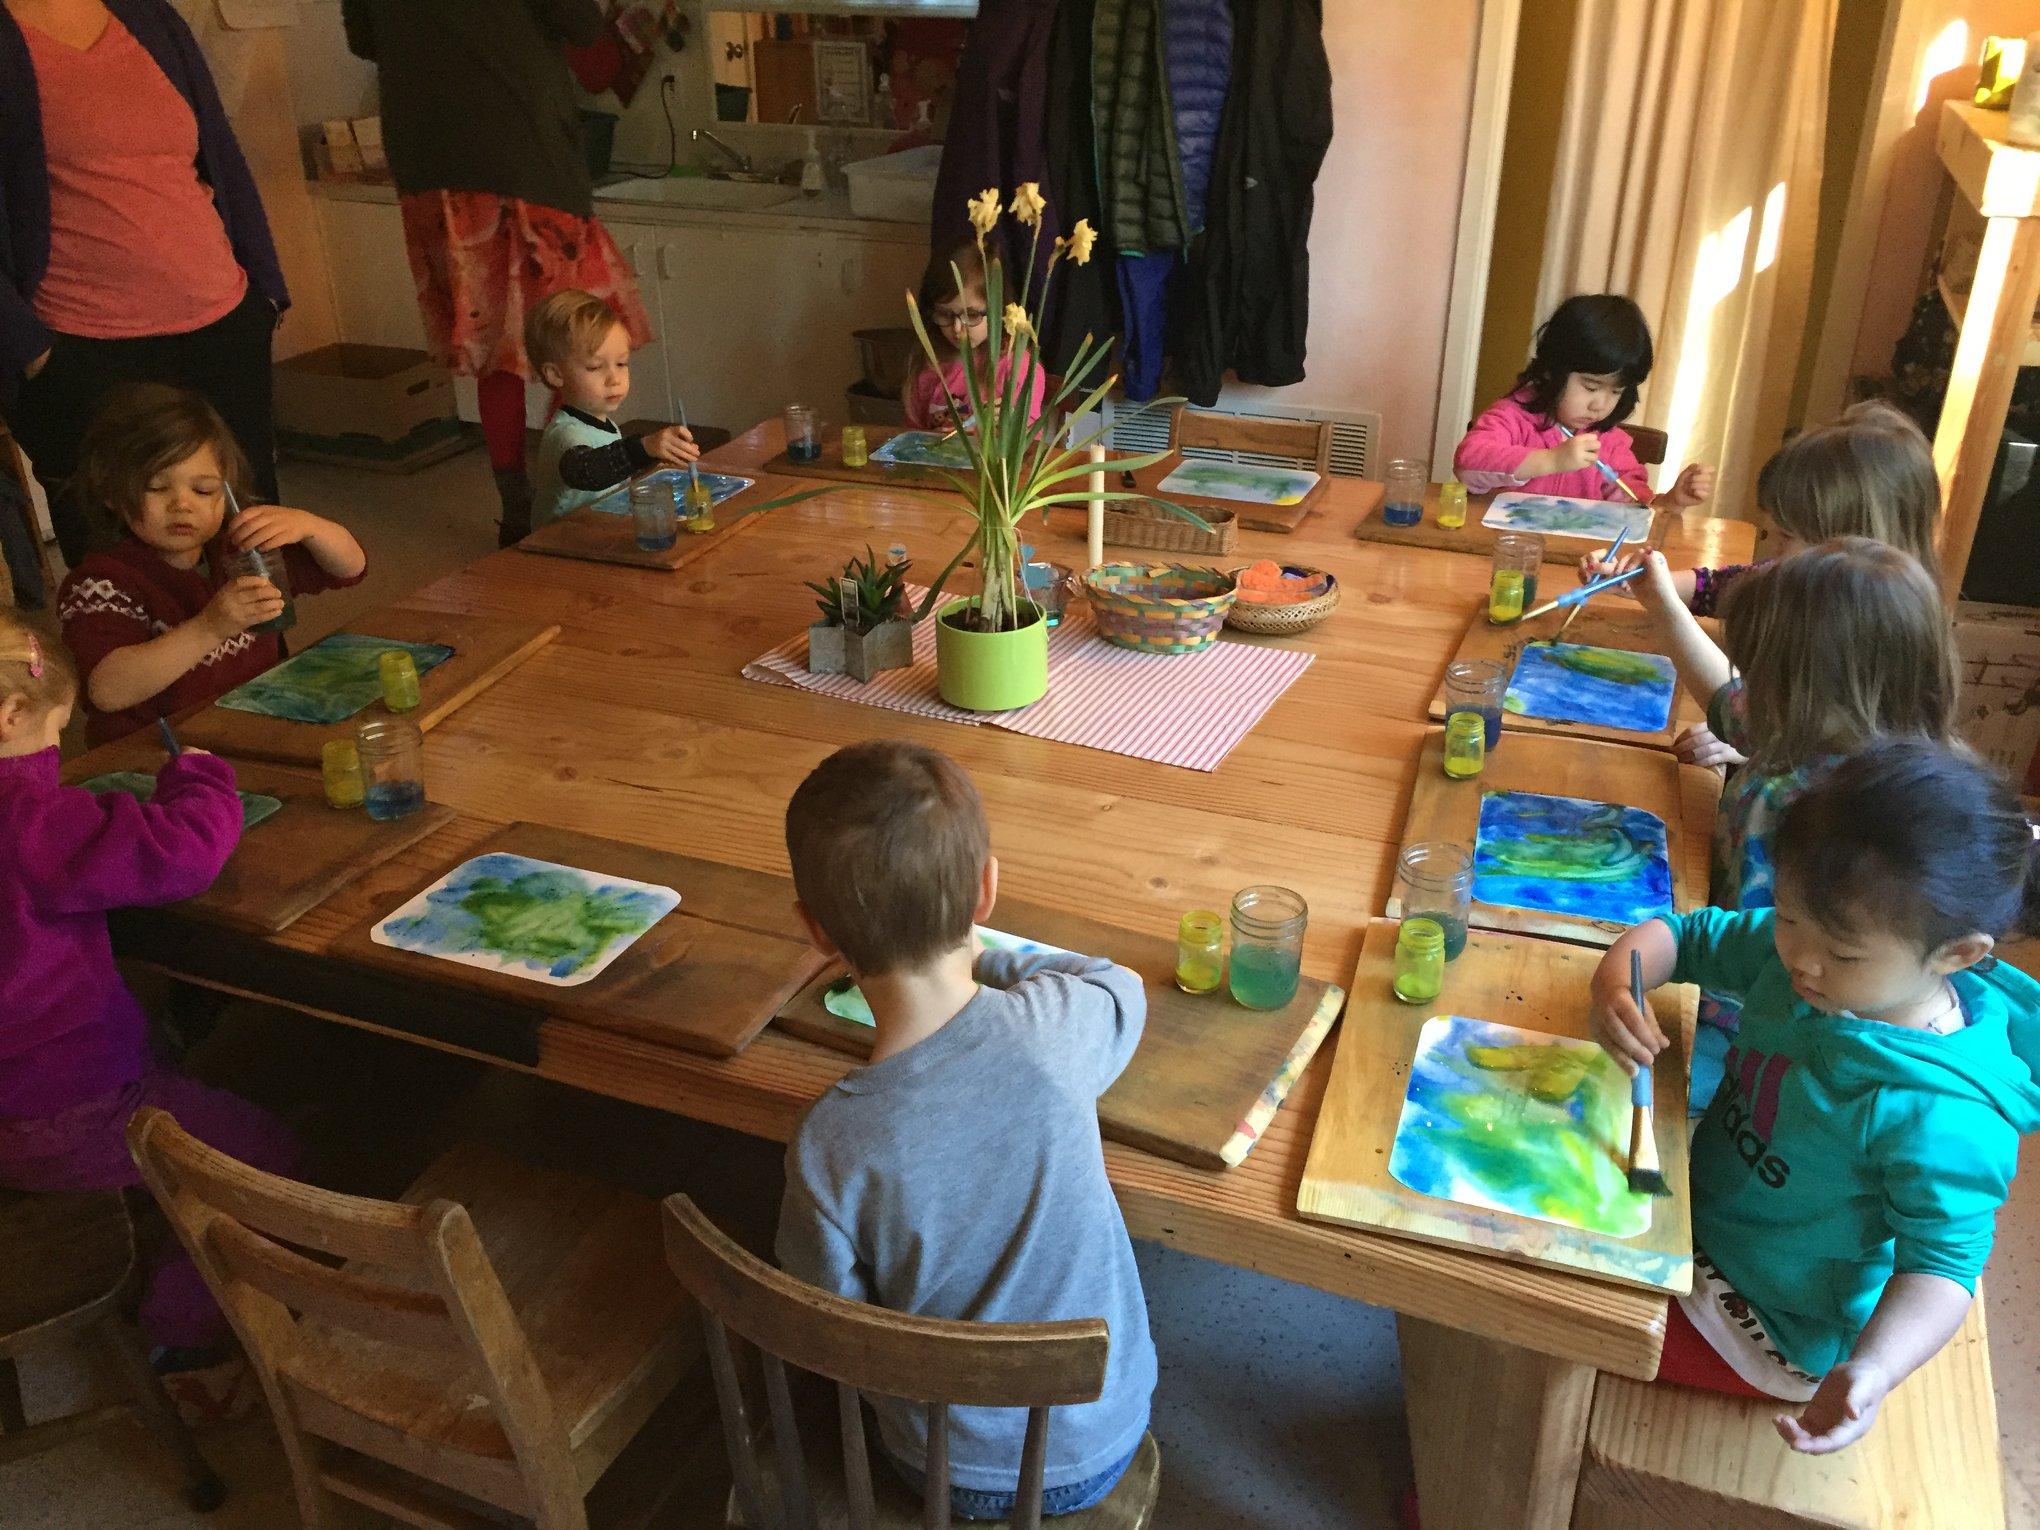 Woodhaven-School-Cooperative-Waldorf-Inspired-Preschool-Portland-Oregon